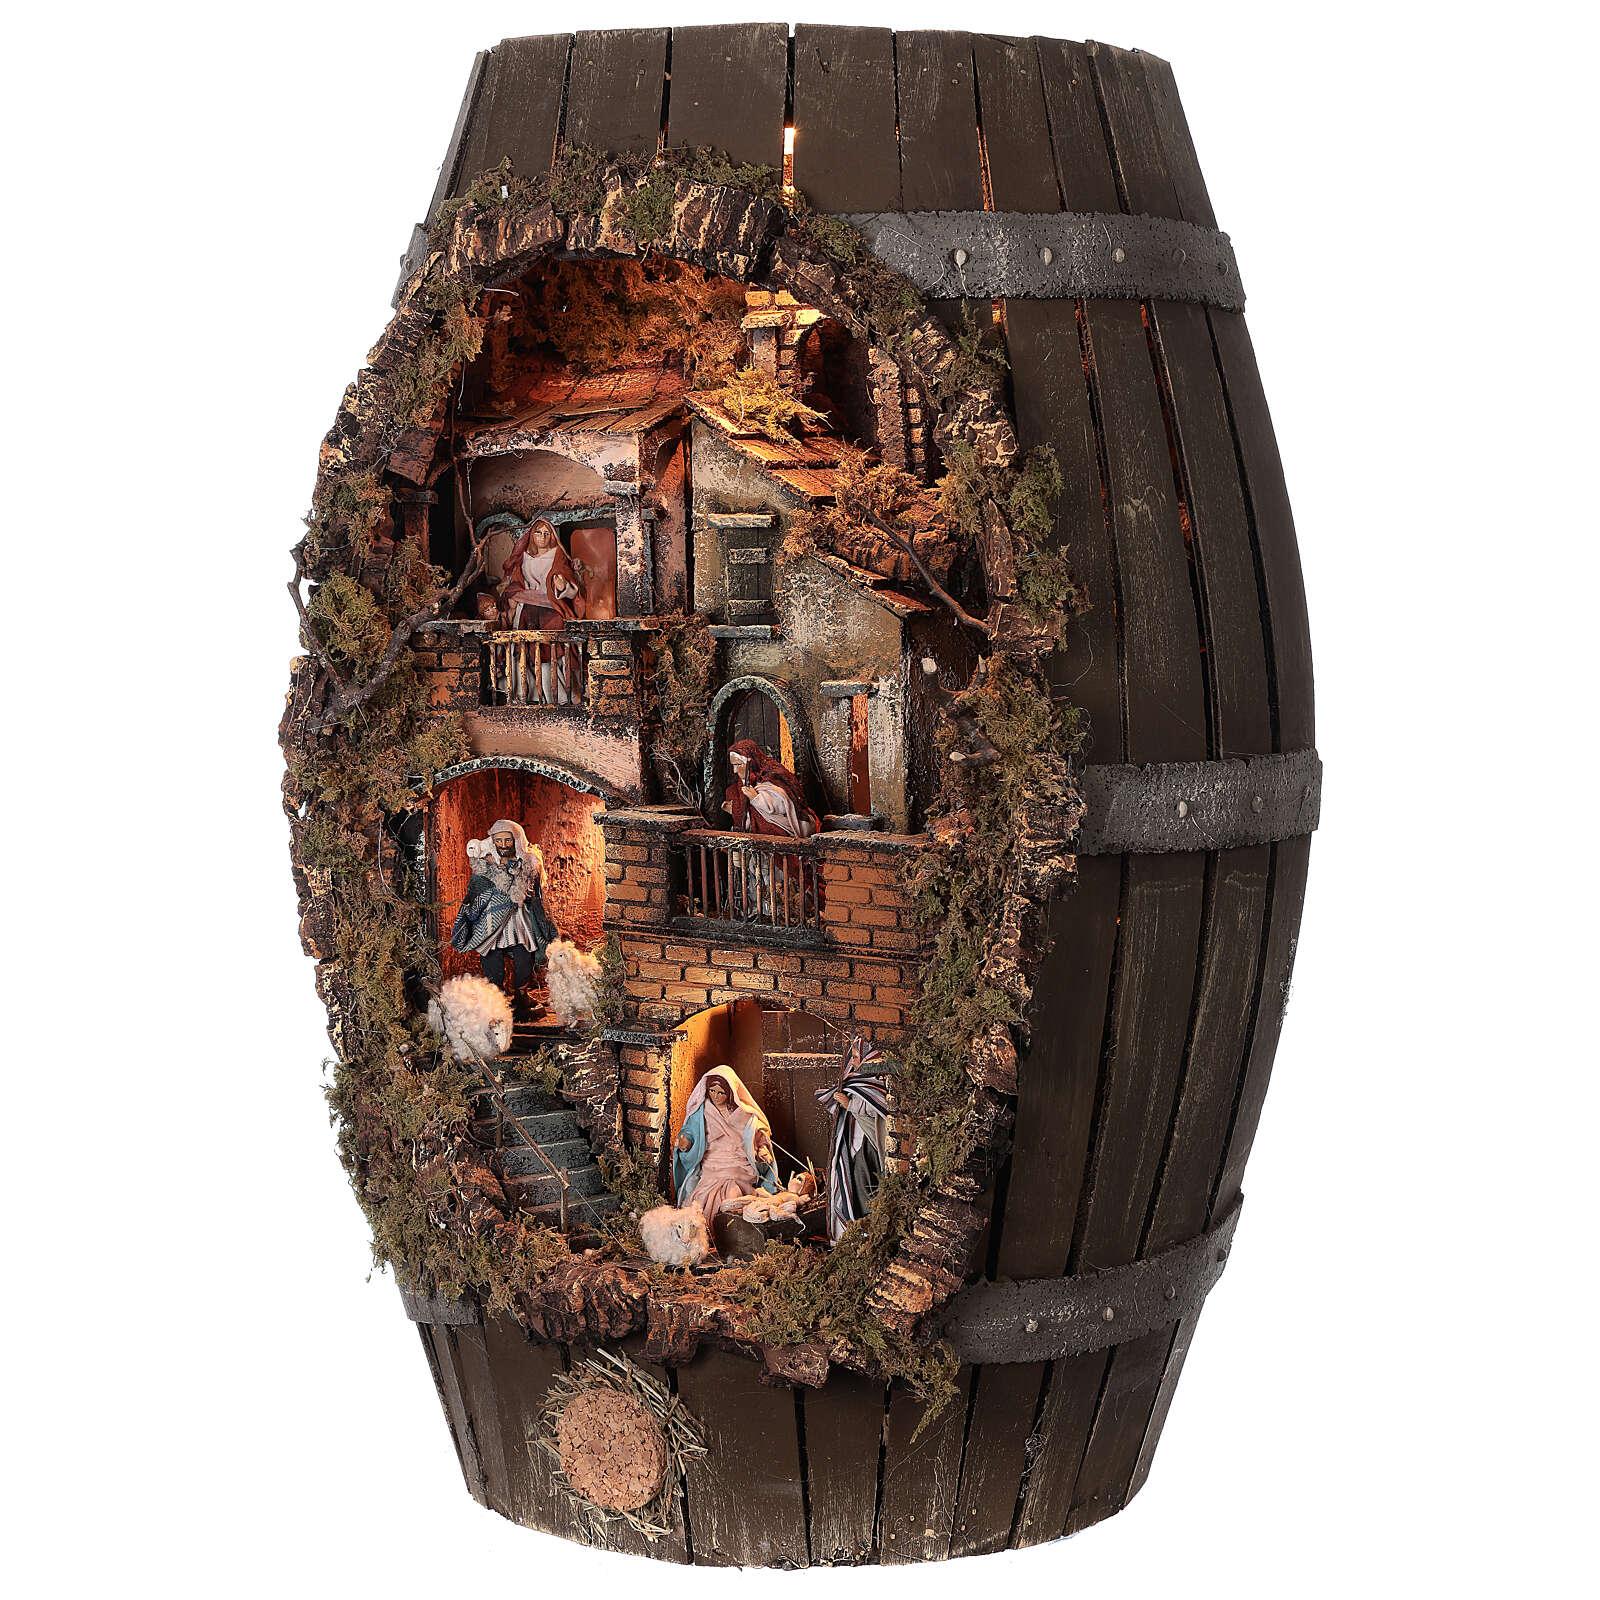 Barrel shaped complete Neapolitan Nativity Scene 60x30x25 cm for figurines of 8 cm average height 4